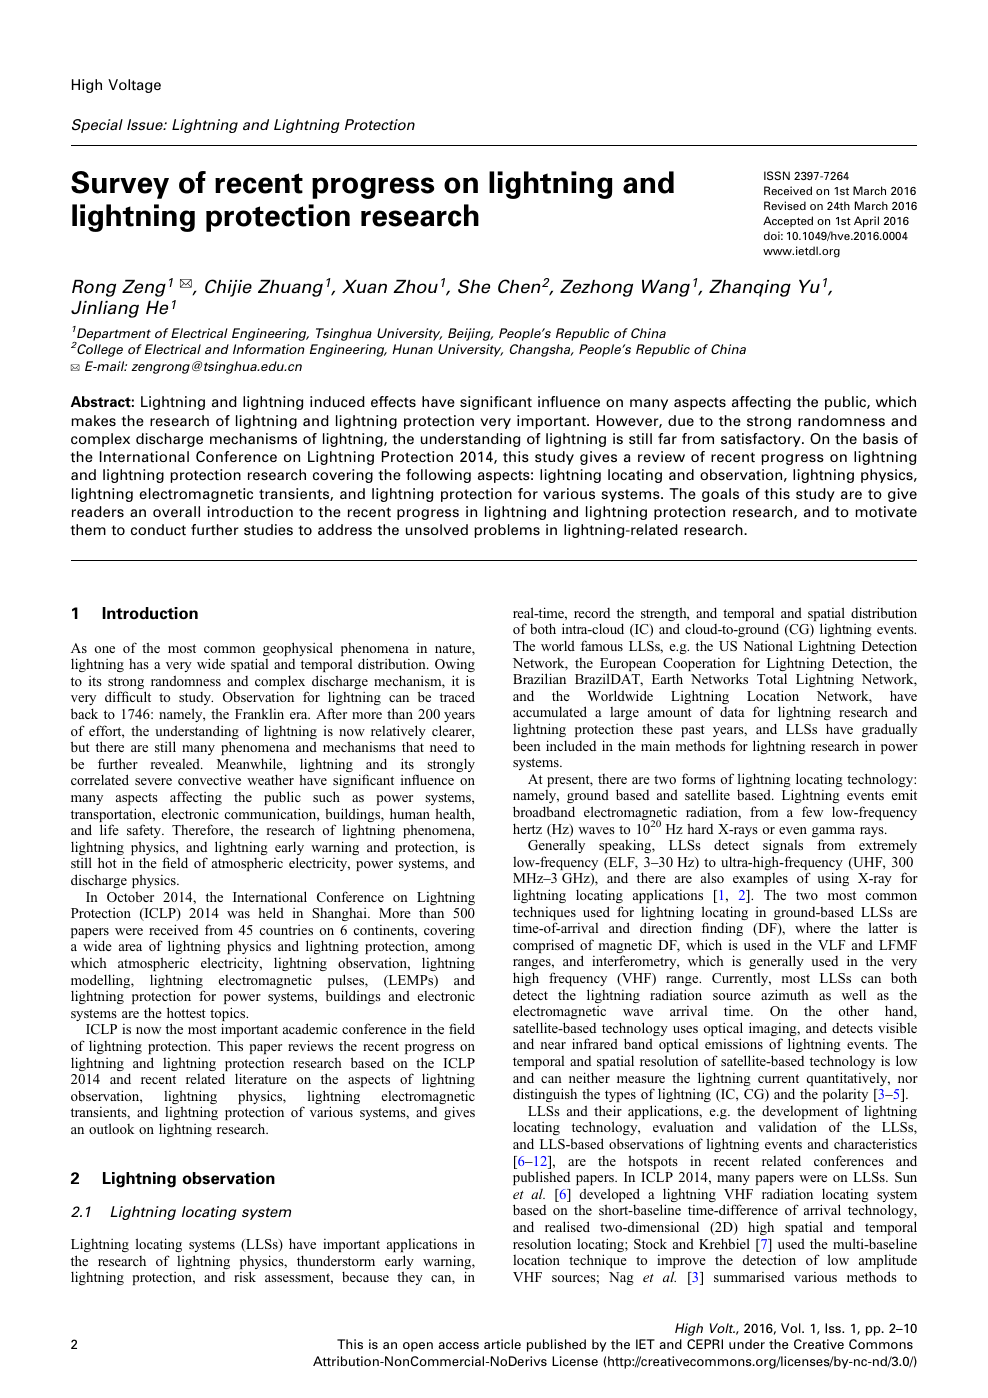 Lighting induced overvoltage phenomena in high voltage overhead distribution networks